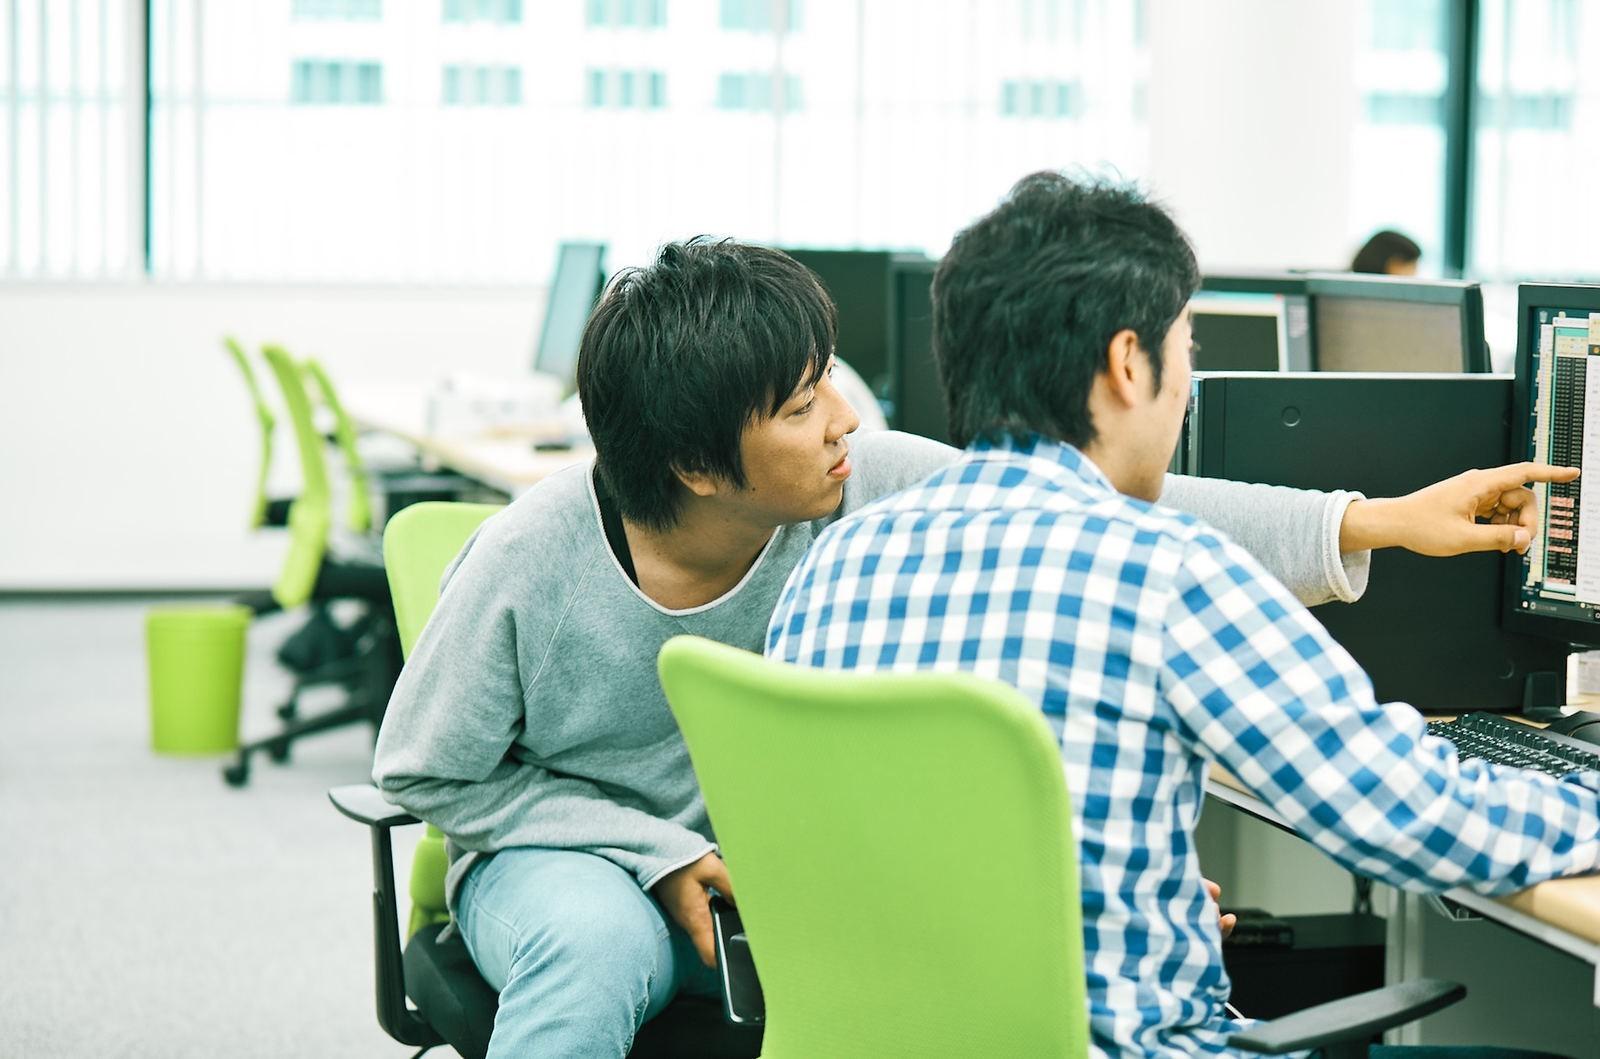 HRTech業界を牽引する【プロダクトマネージャー】募集